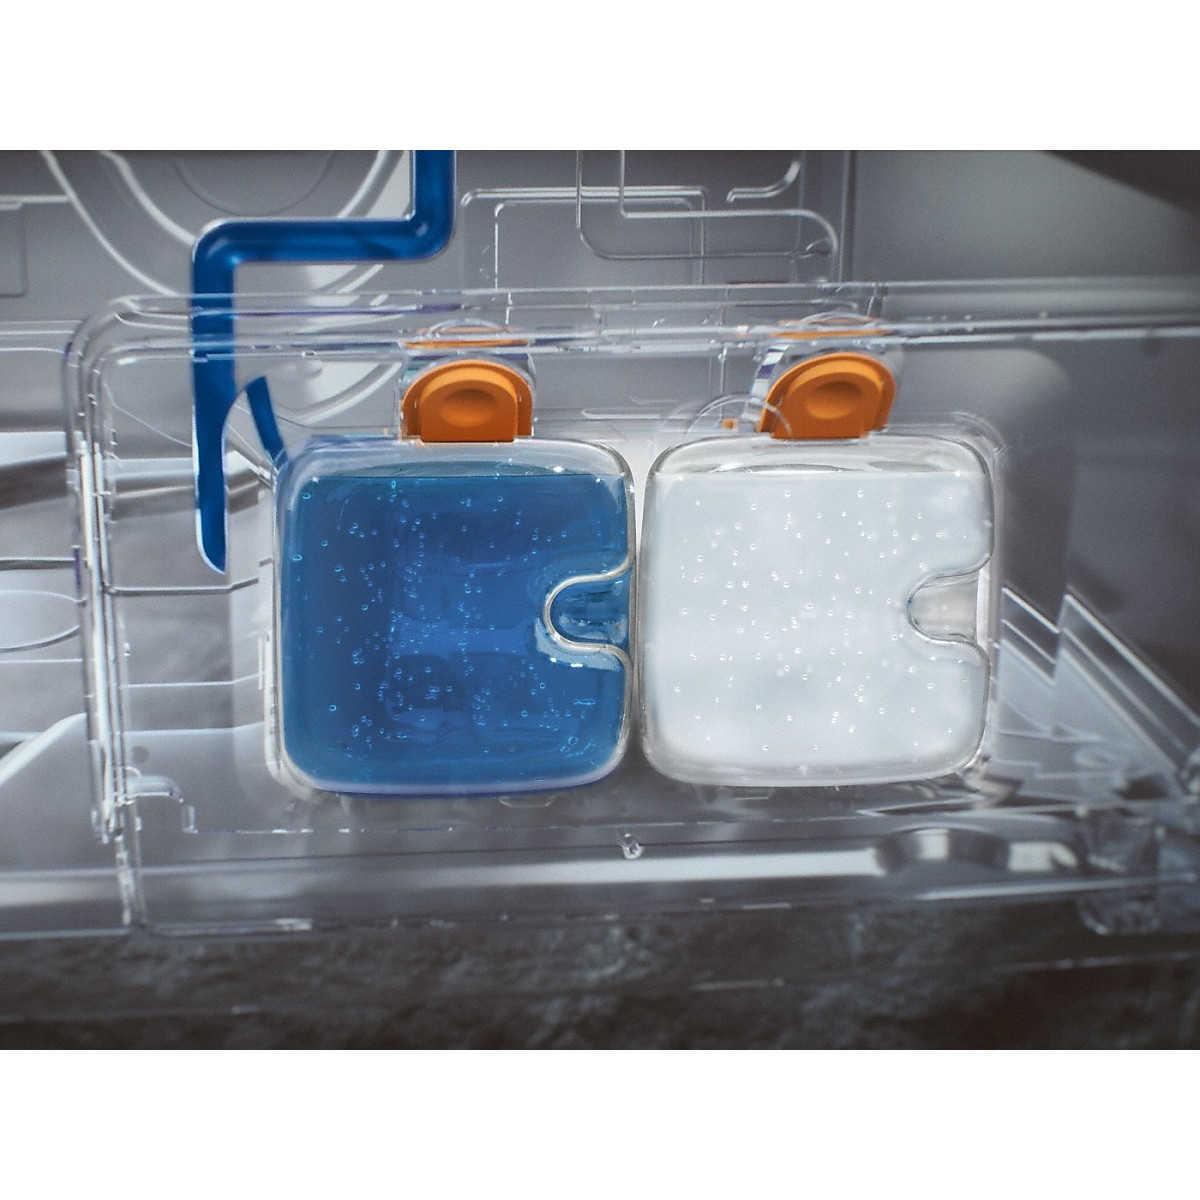 1490-Mașină de spălat WWG760 WPS TDos,9kg - Miele